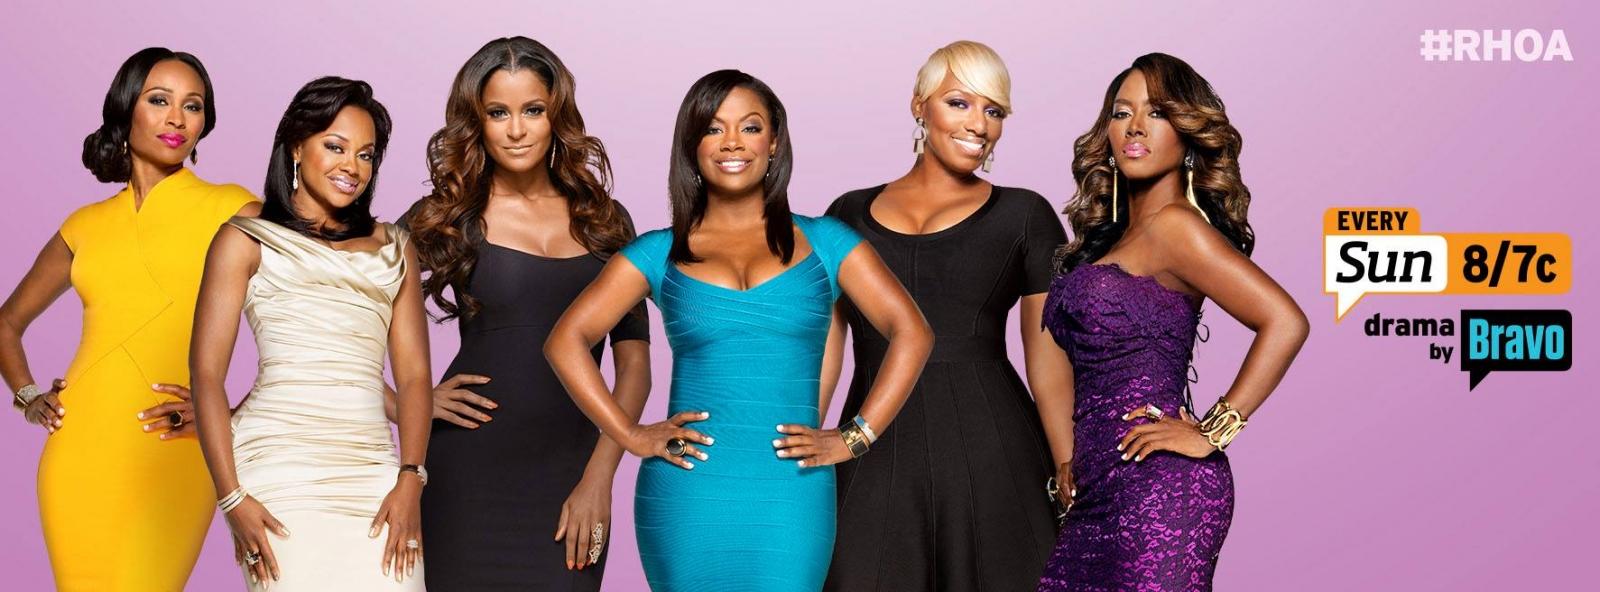 Claudia Jordan's ugly feet triggers Twitter fury: Real Housewives of Atlanta star Nene Leak makes fun of her